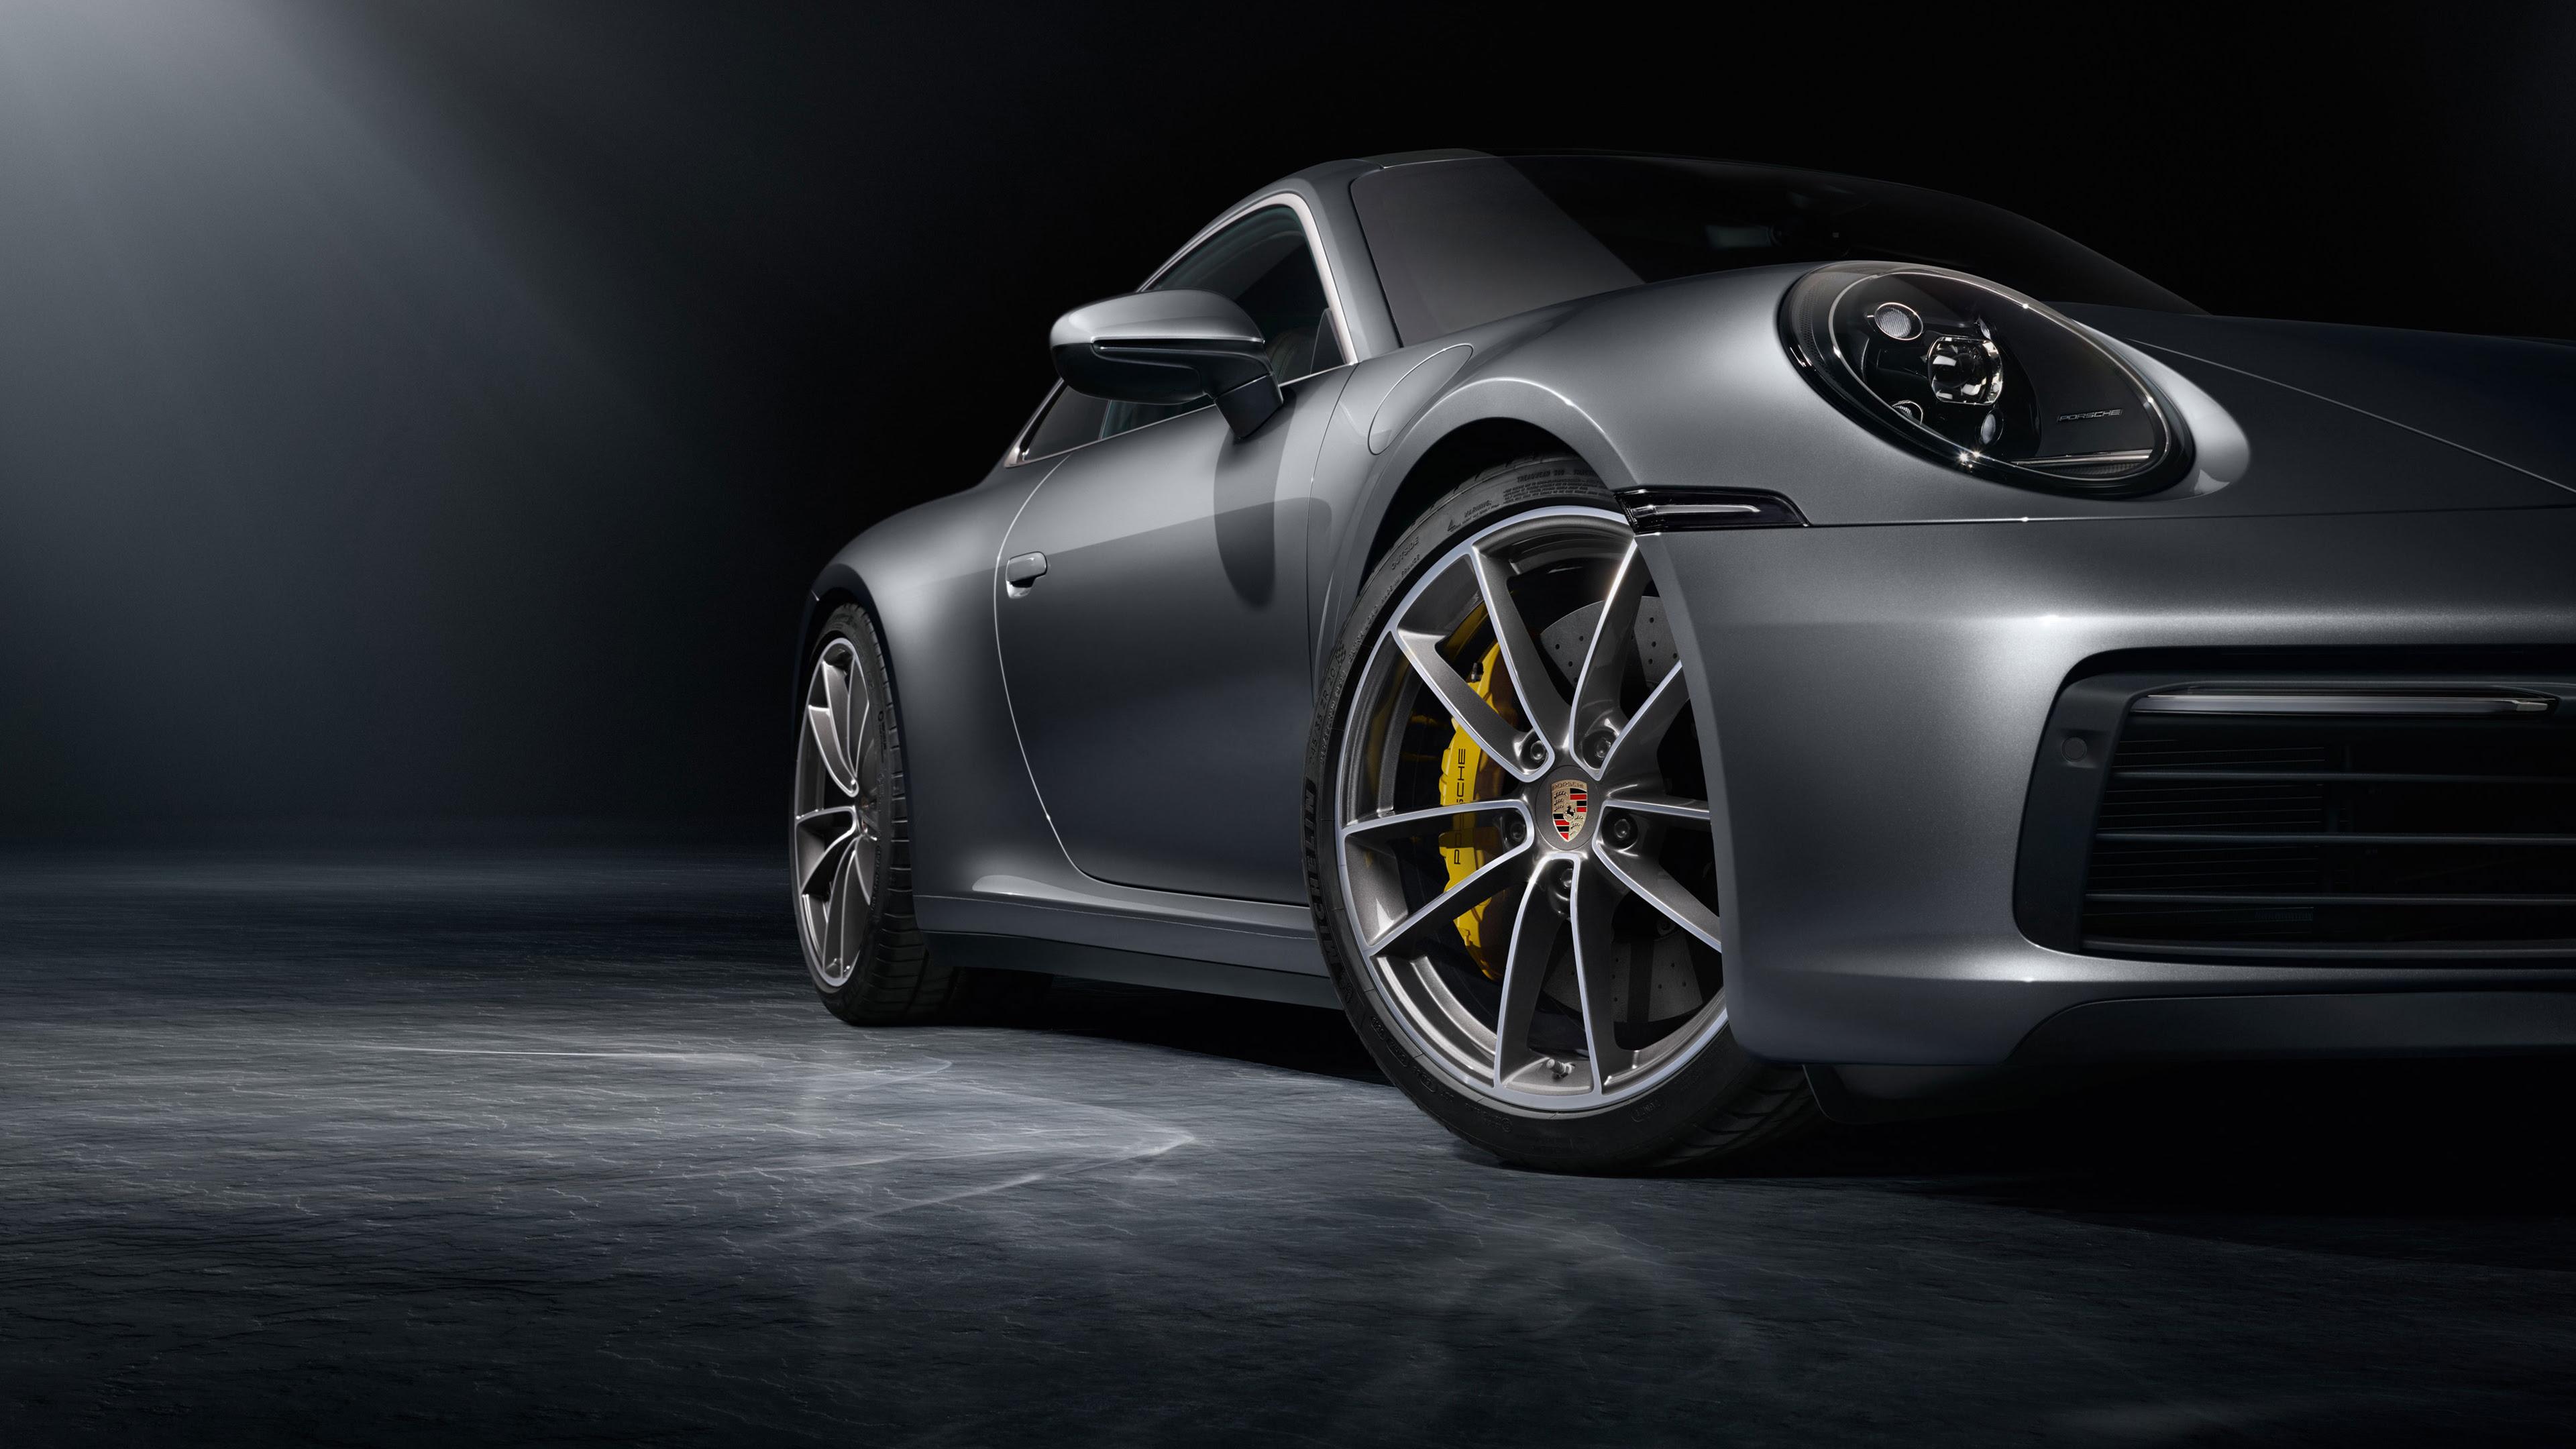 Porsche 911 Carrera S 2019 4k Wallpaper Hd Car Wallpapers